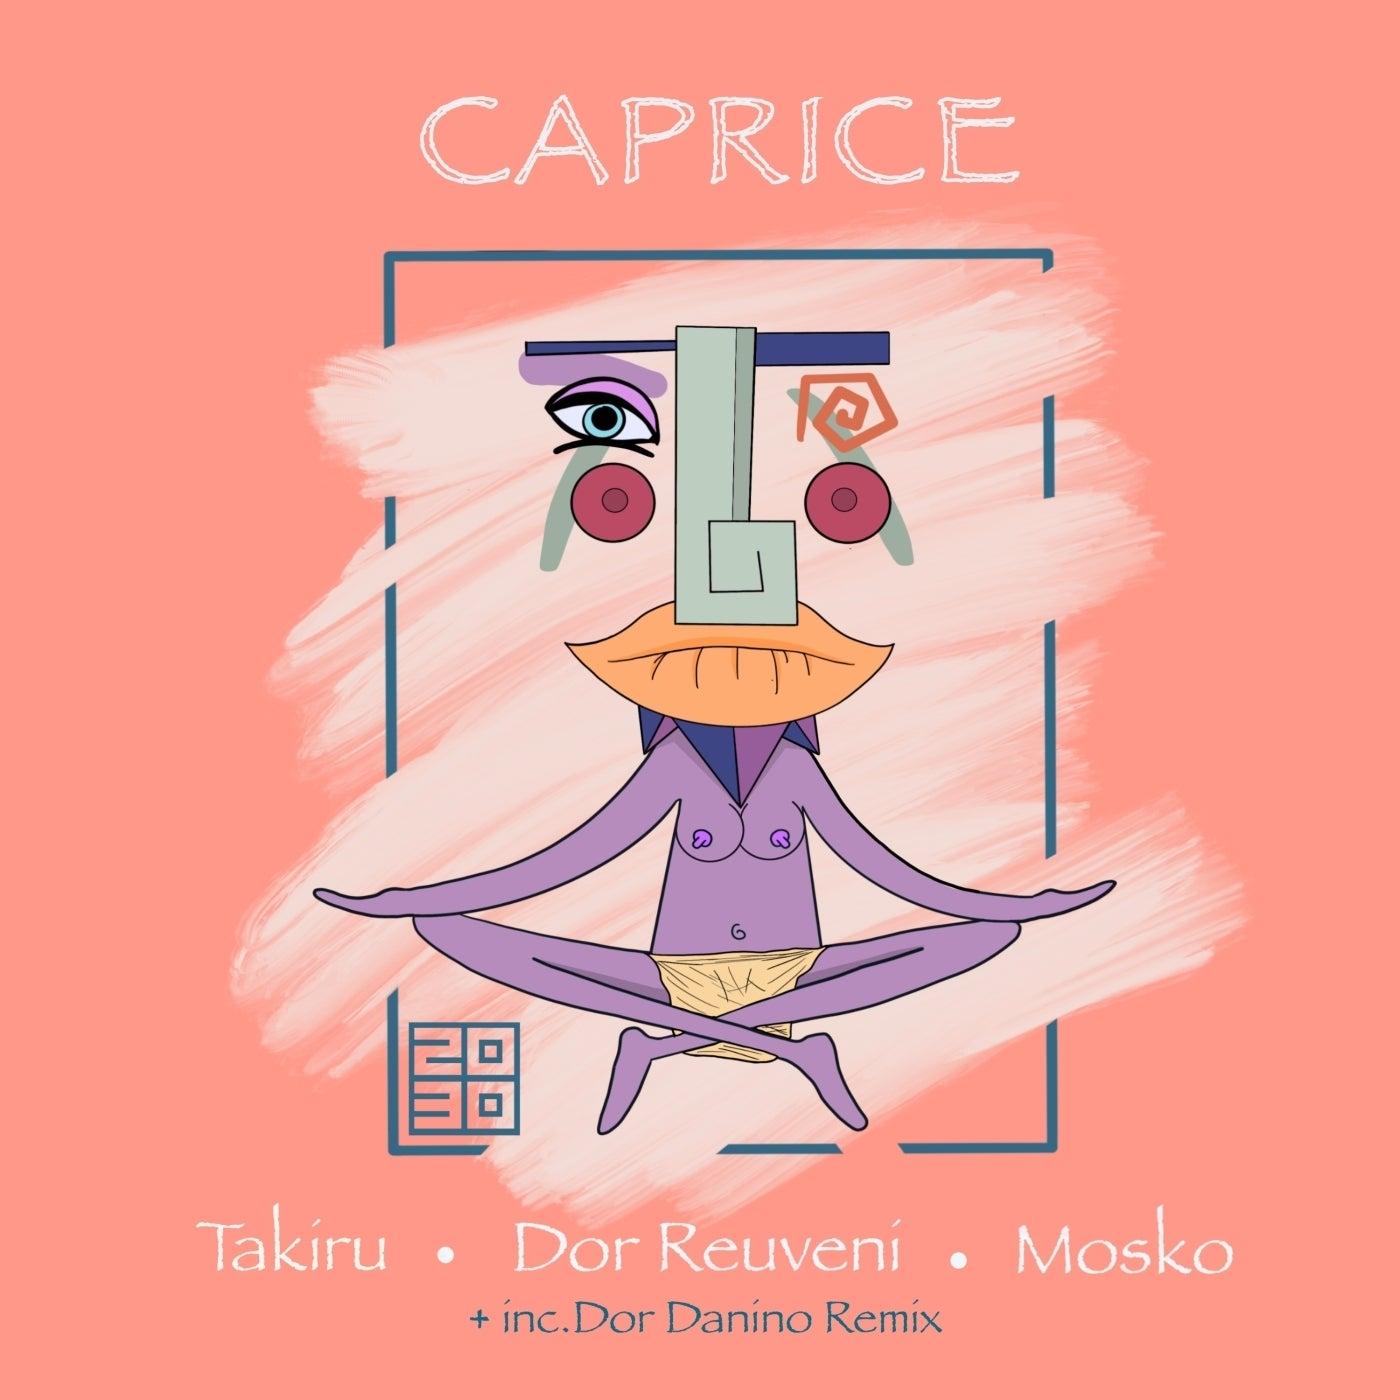 Caprice feat. Ed'n LKS (Dor Danino Remix)